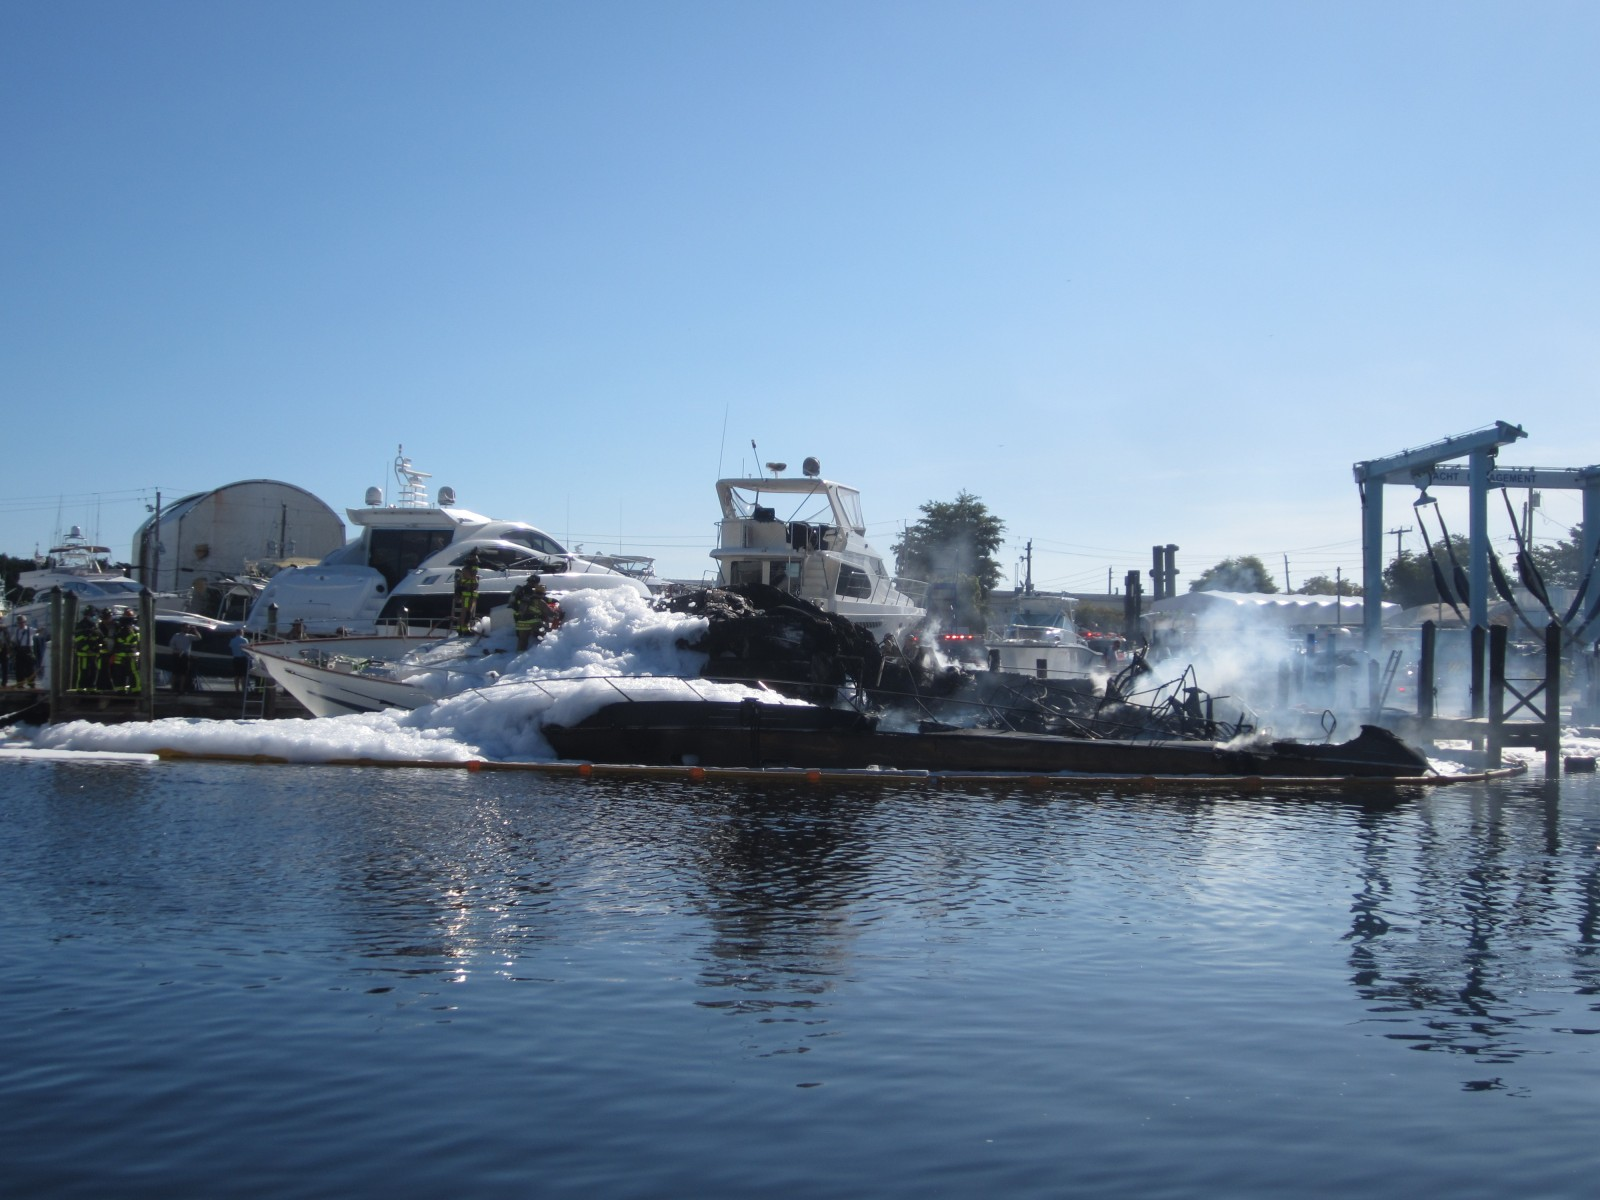 Fire New River marina LCR 038